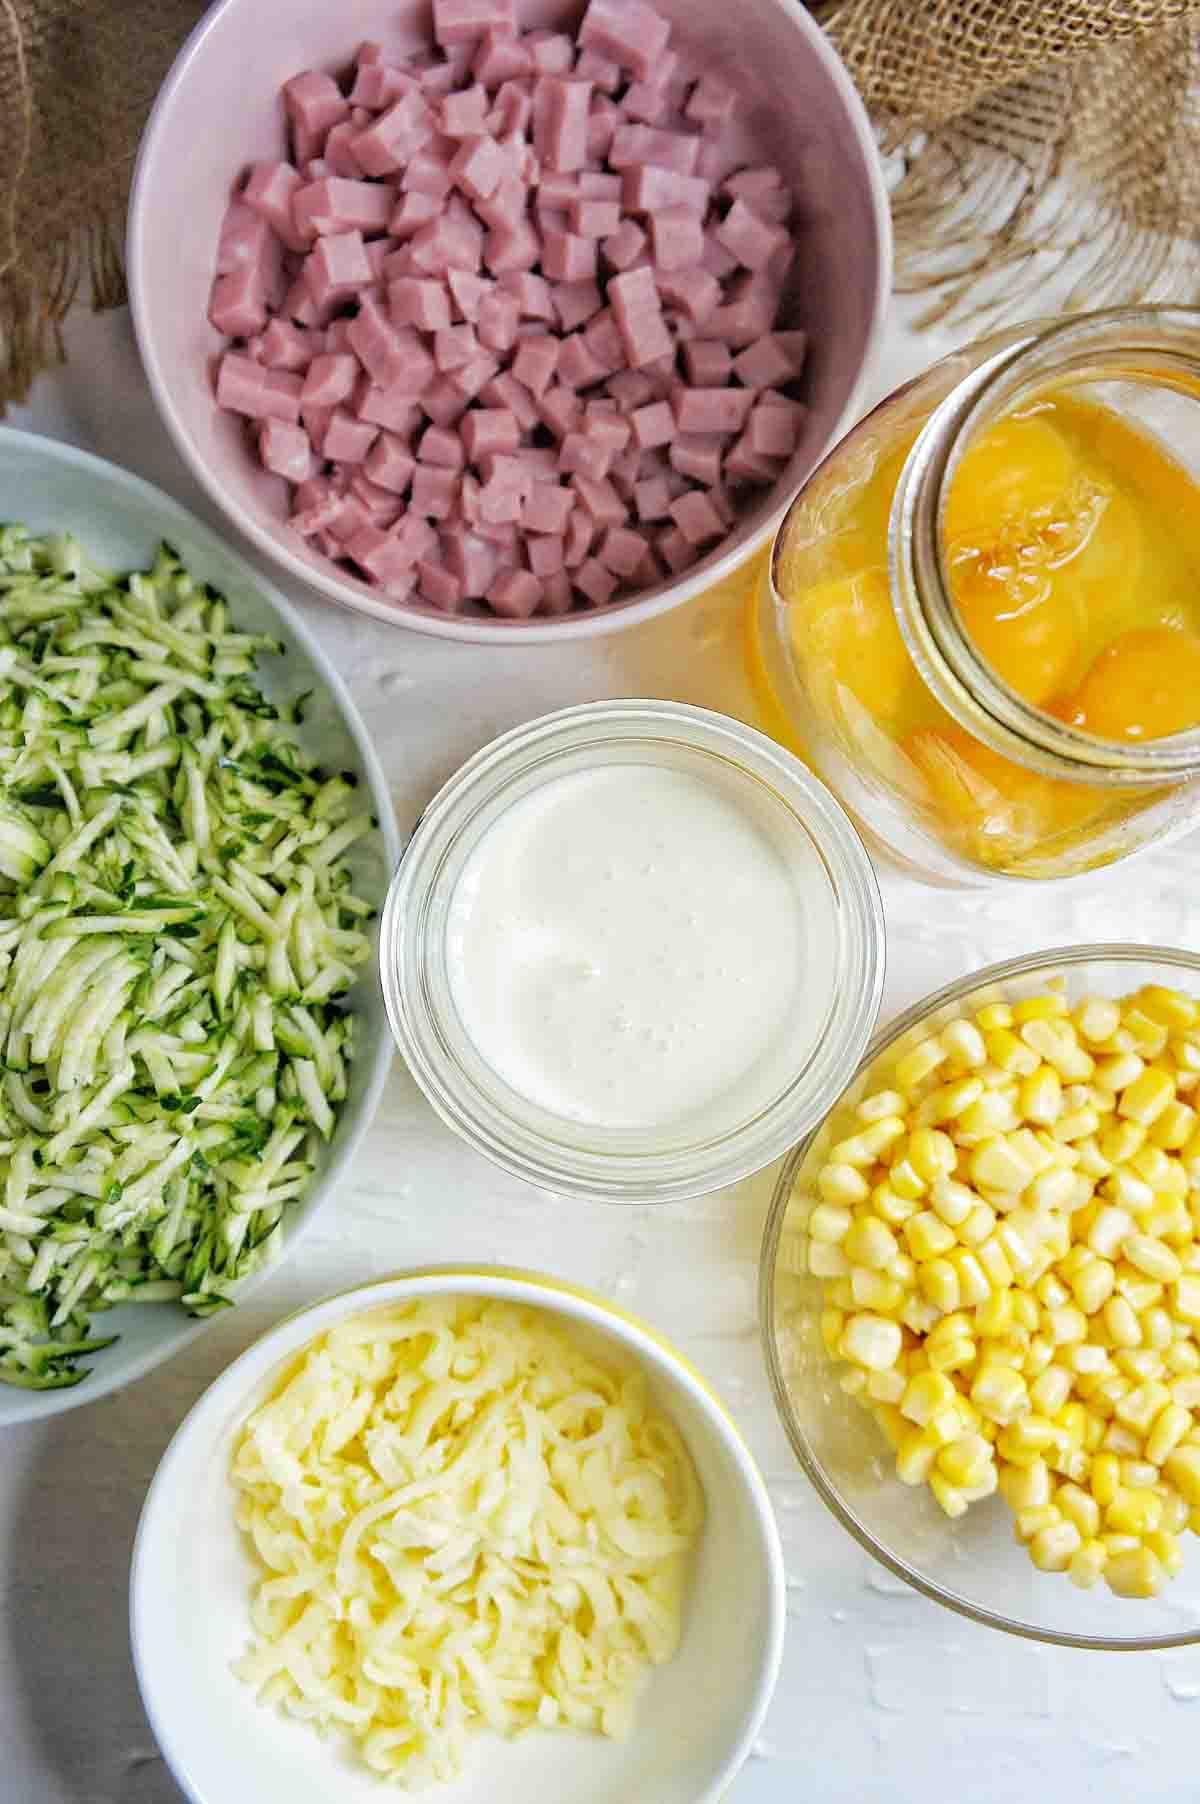 Ingredients for gluten free zucchini slice recipe